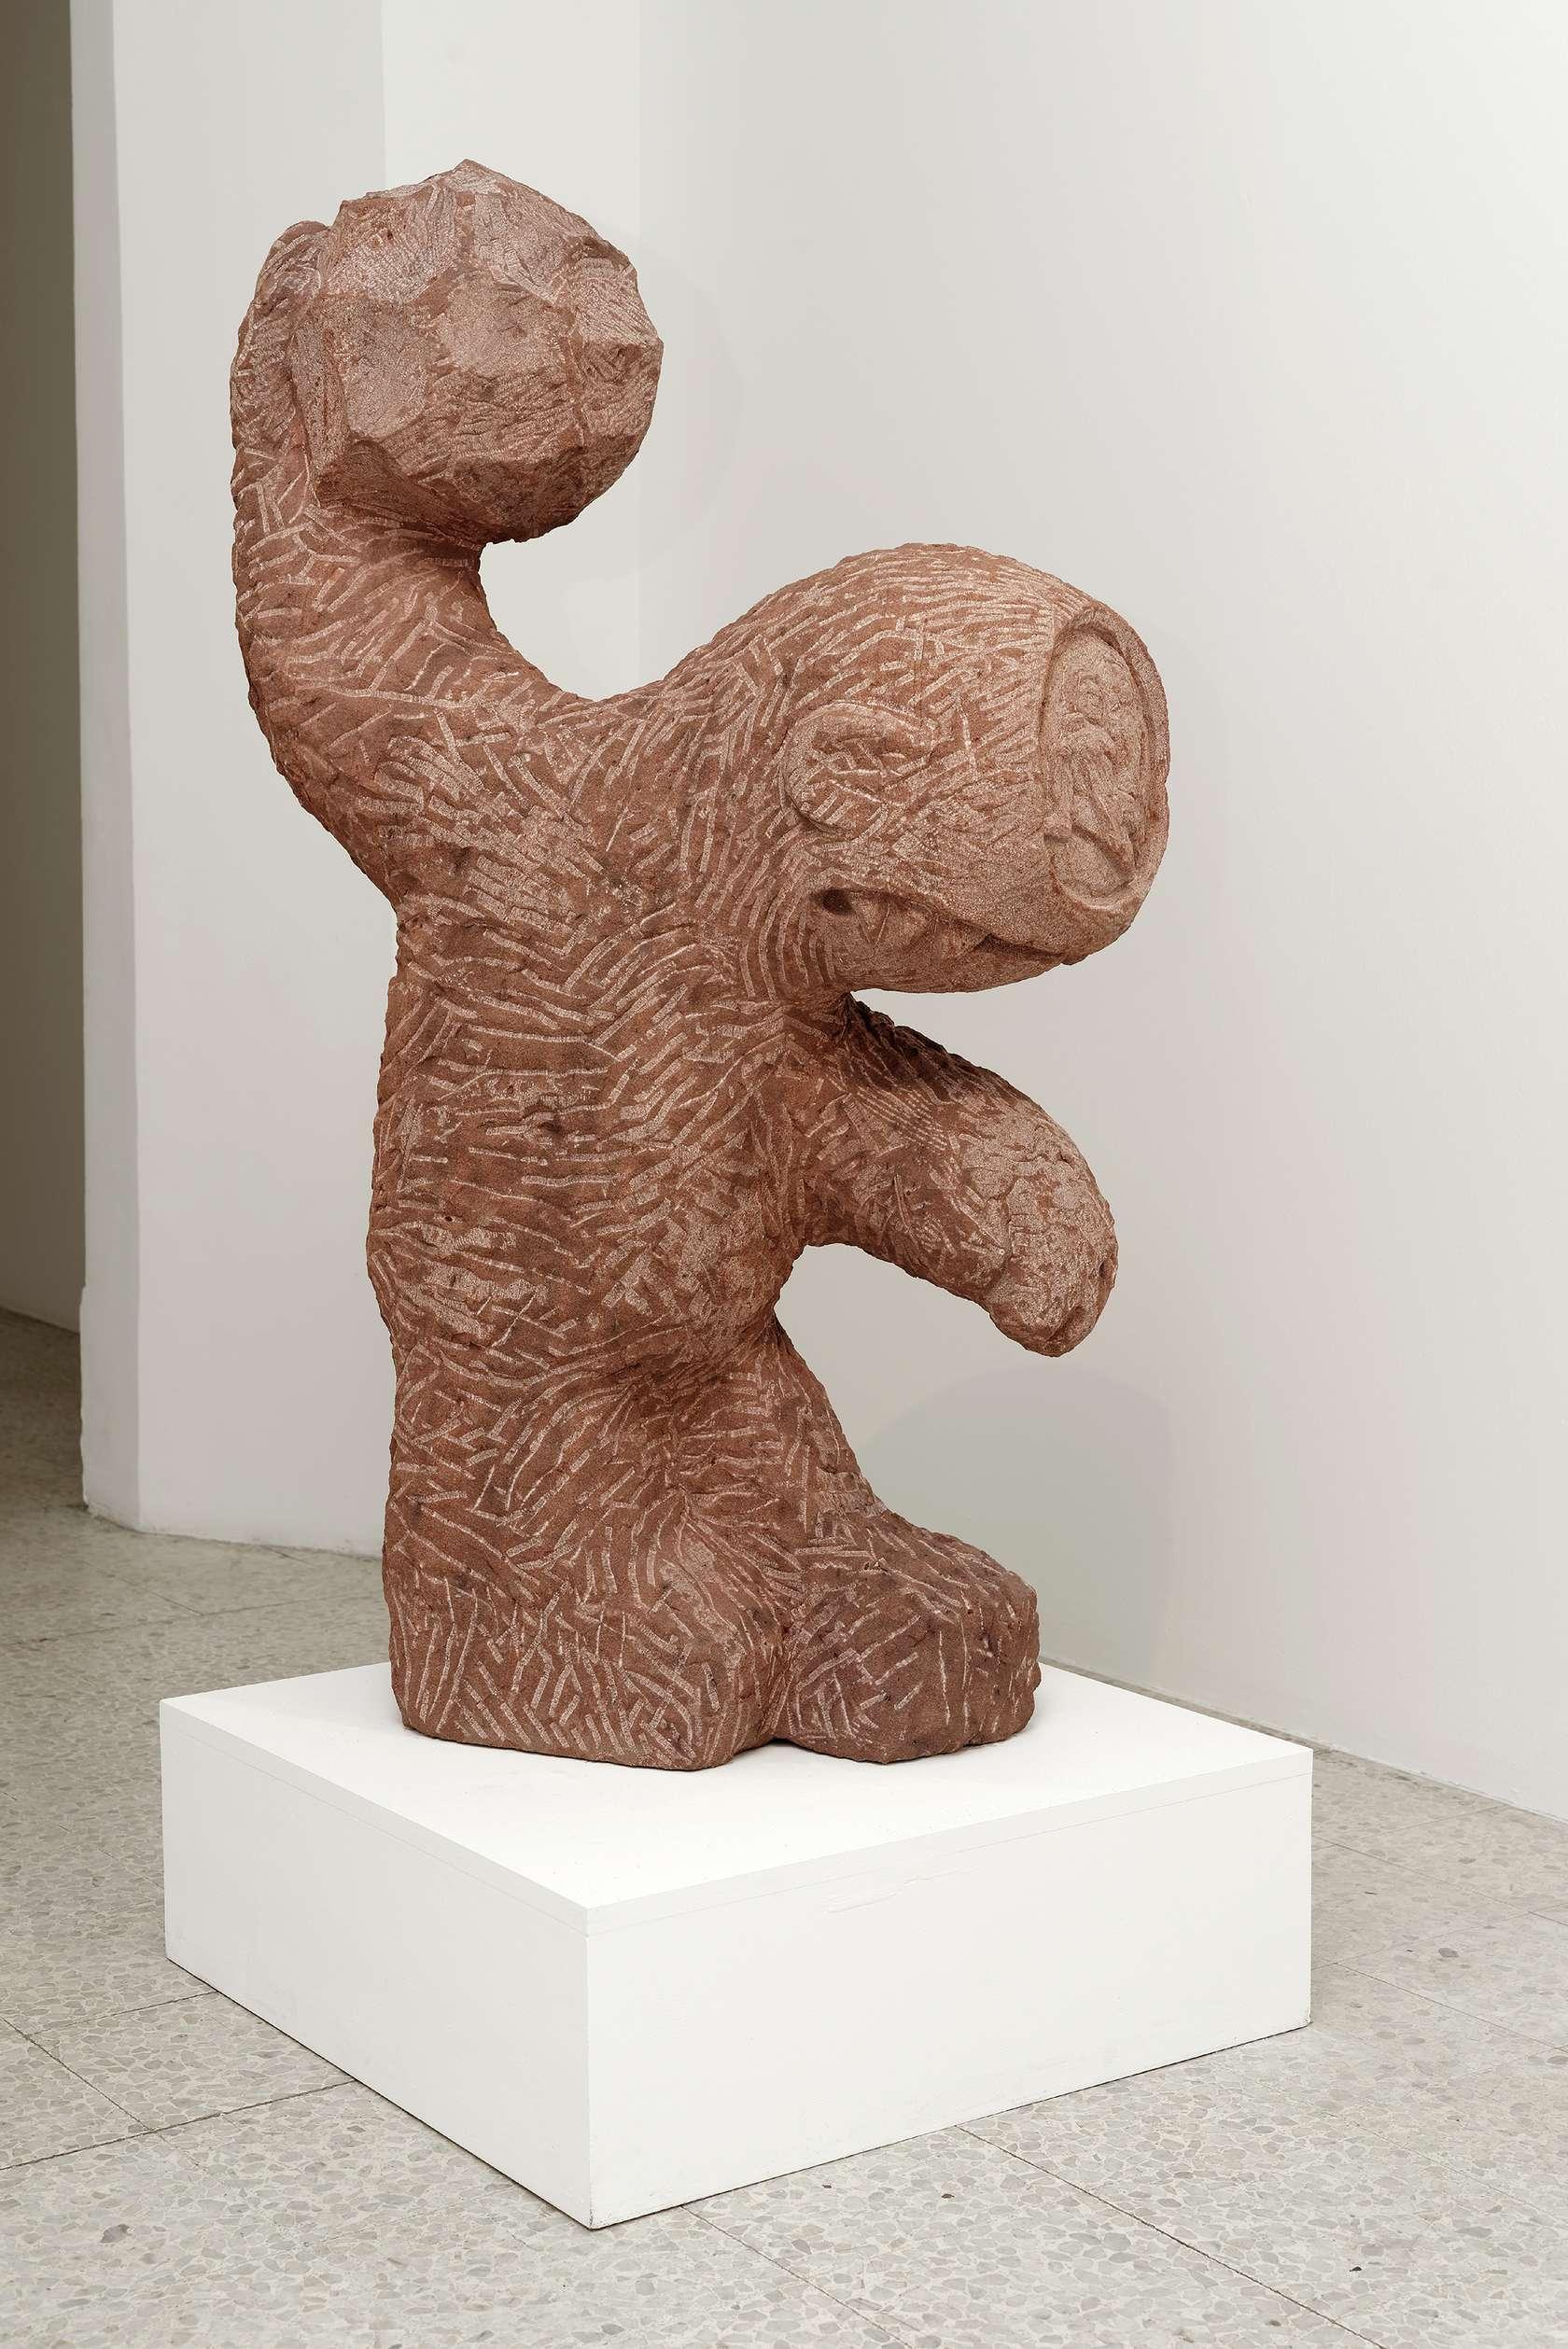 Stefan Rinck, Polyphemus, 2016 Grès120 × 70 × 35 cm / 47 2/8 × 27 1/2 × 13 6/8 in.